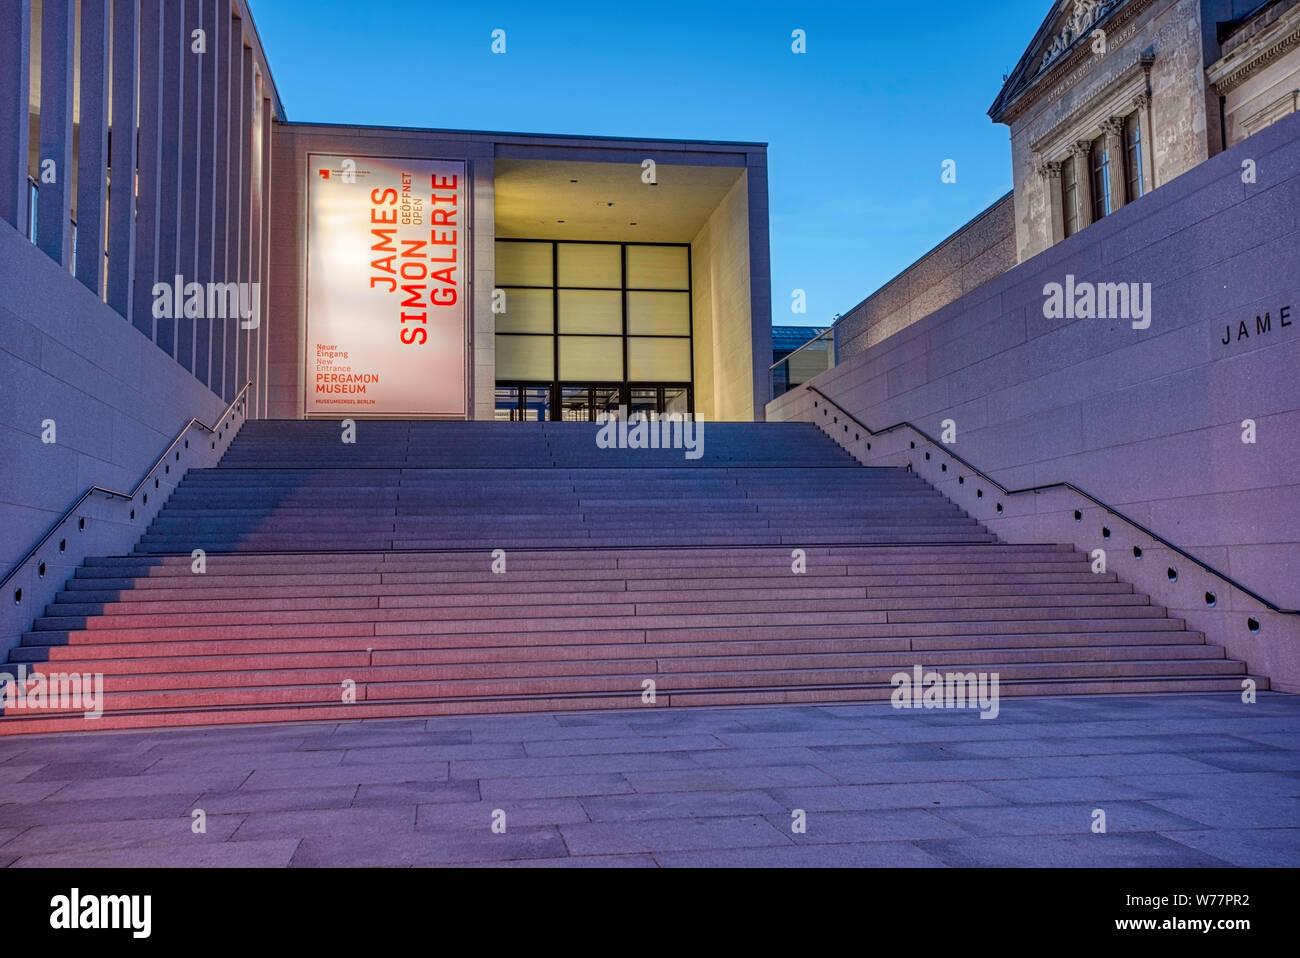 Construction Site Pergamon Museum Museum Stockfotos Und Bilder Kaufen Alamy